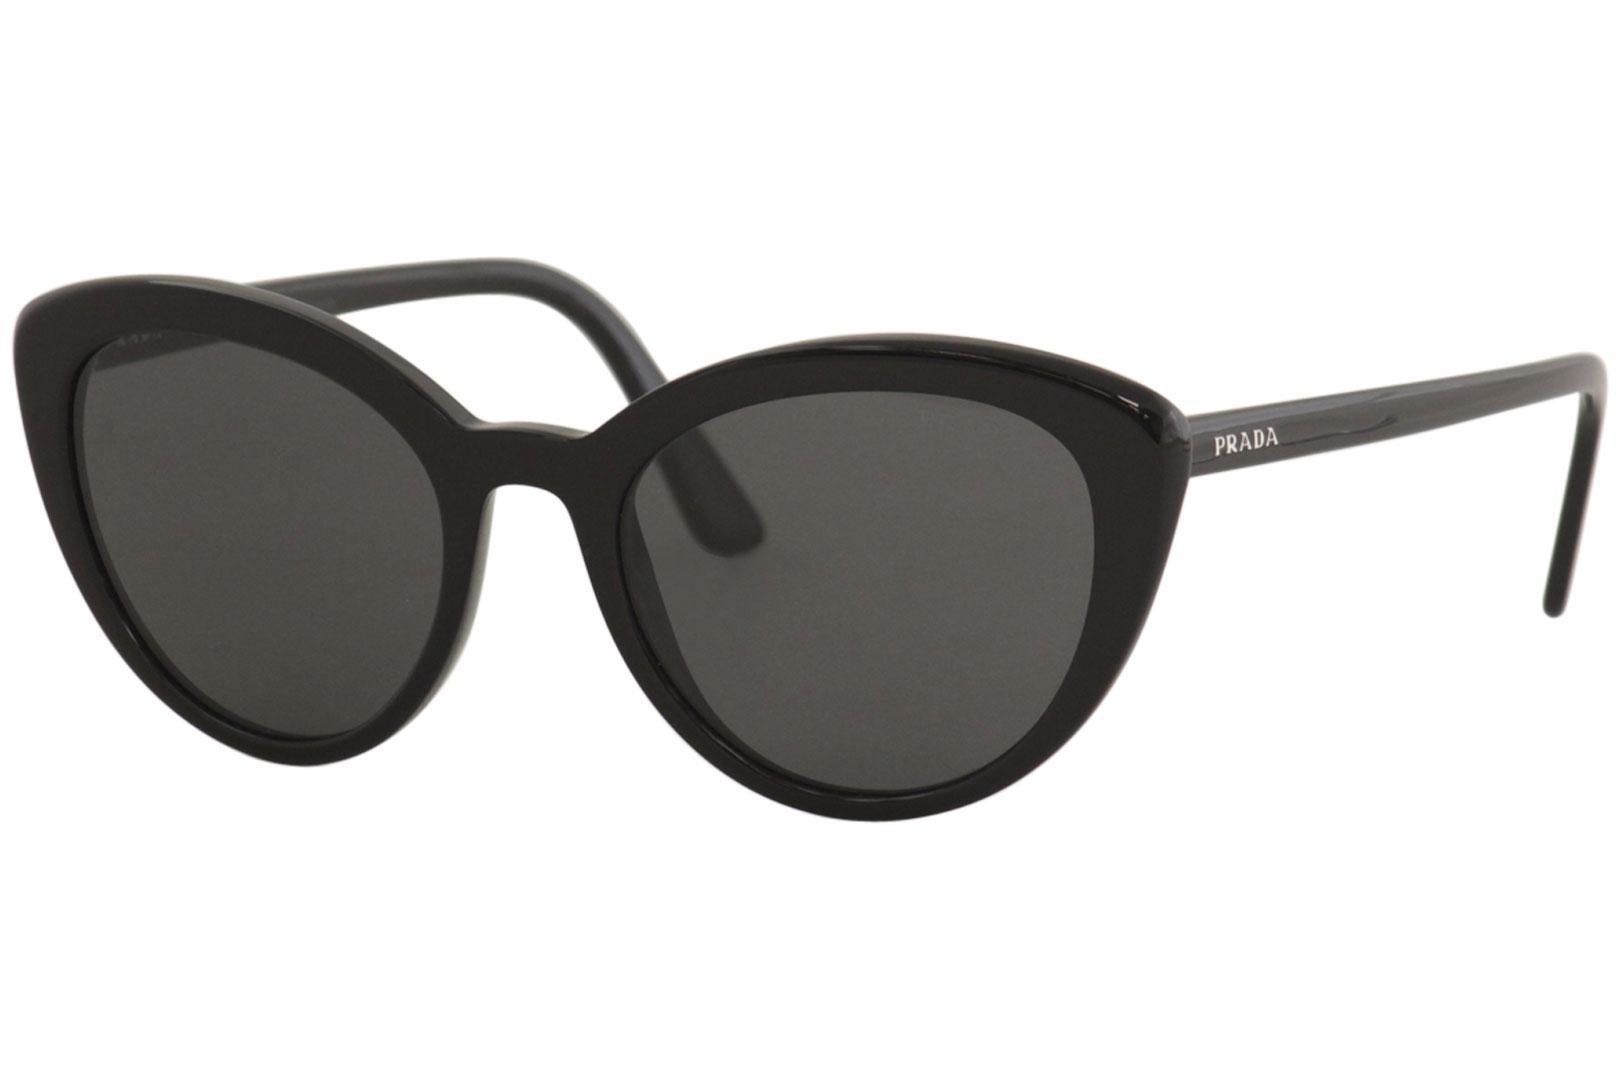 eba605dee7 Prada Women s SPR02V SPR 02 V Fashion Cat Eye Sunglasses by Prada. Touch to  zoom